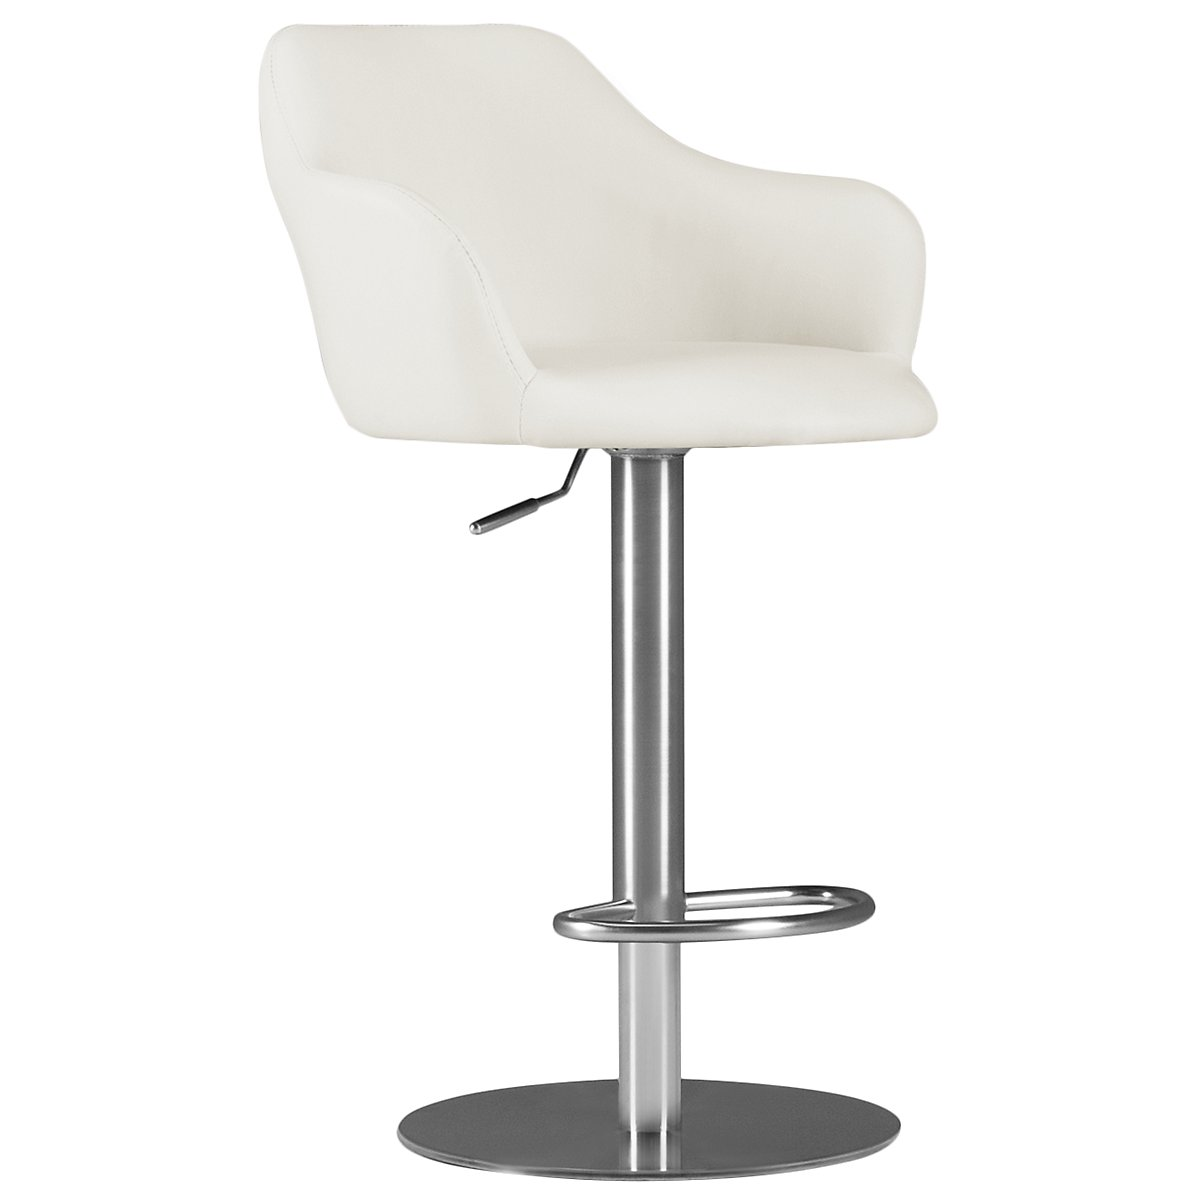 Hyde White Upholstered Adjustable Stool